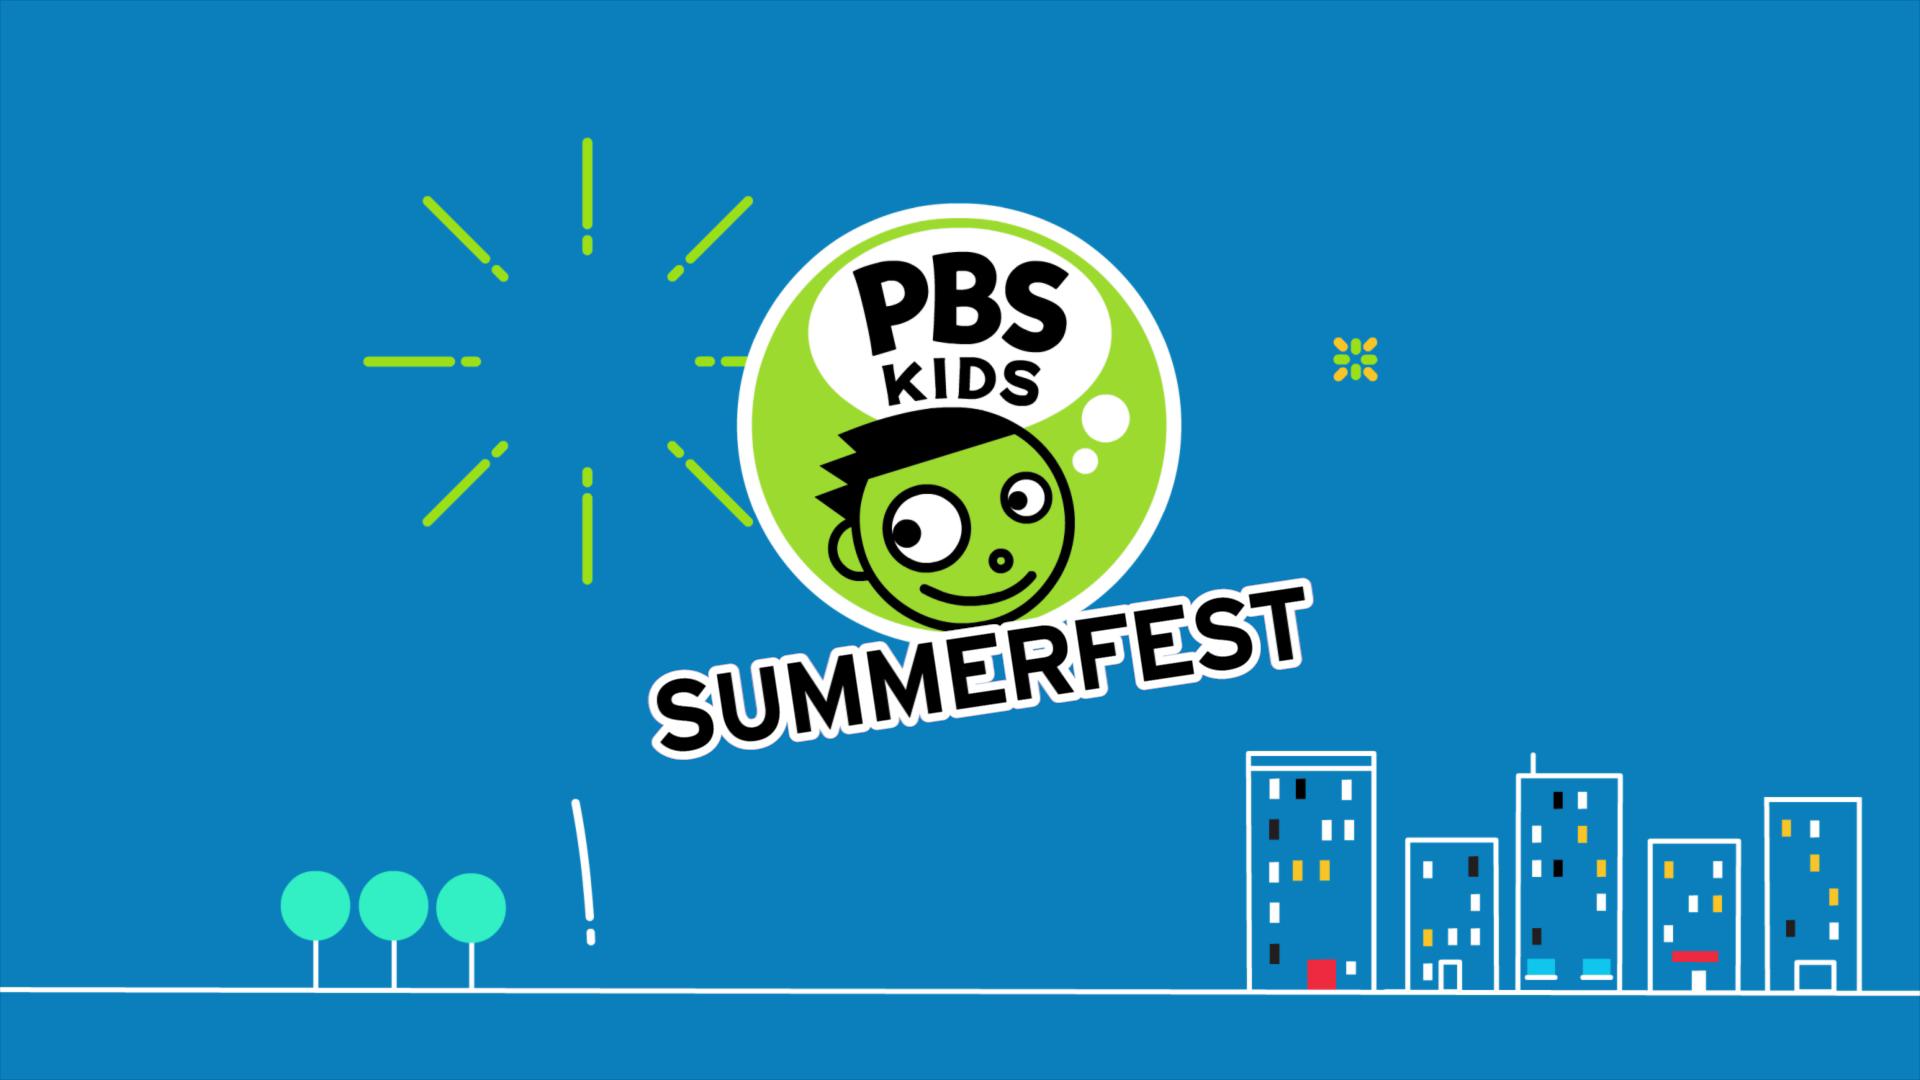 Video Summerfest Promo Watch Oeta Presents Online